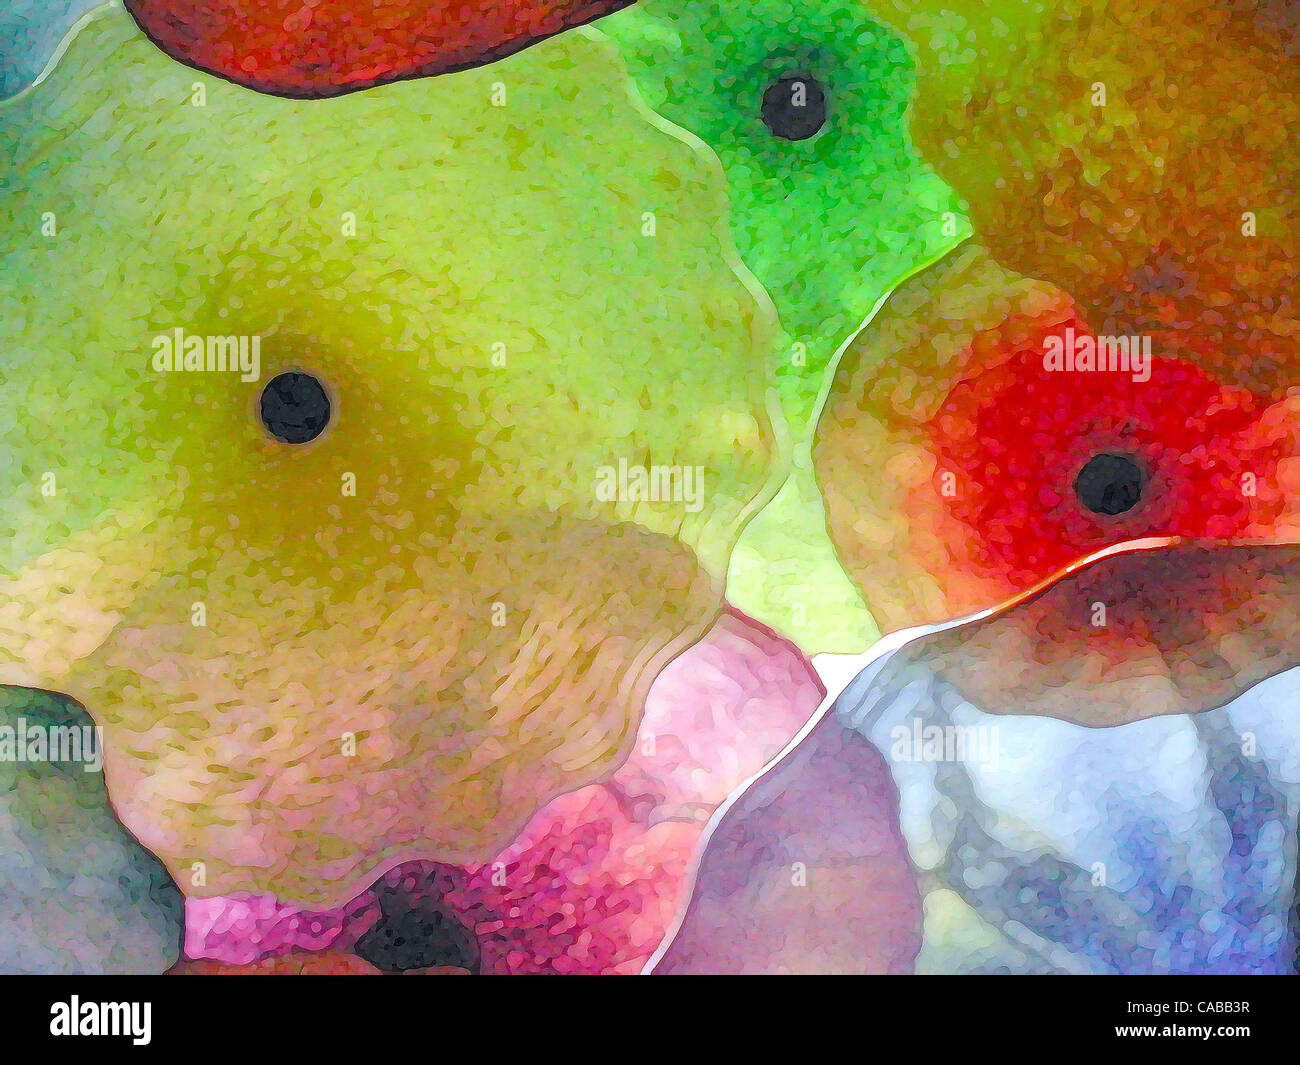 Jun 03, 2004; Los Angeles, CA, EUA; Resumo flores de vidro. Imagens de Stock